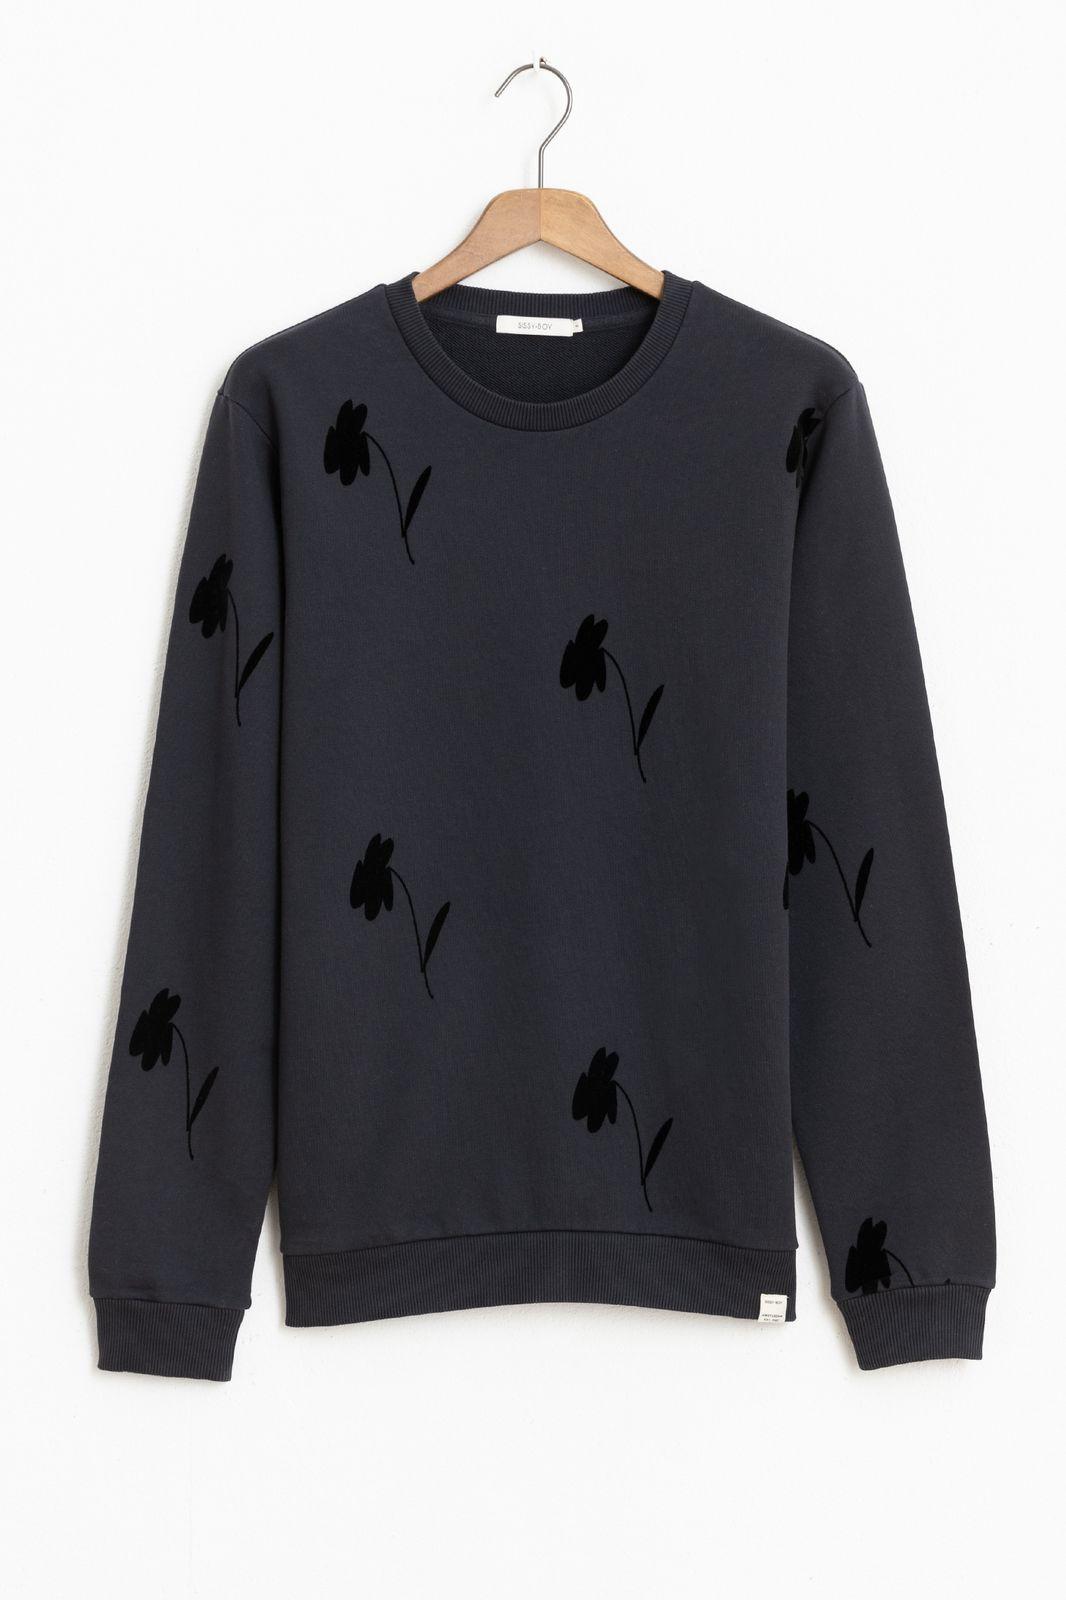 Donkergrijze sweater met all over print